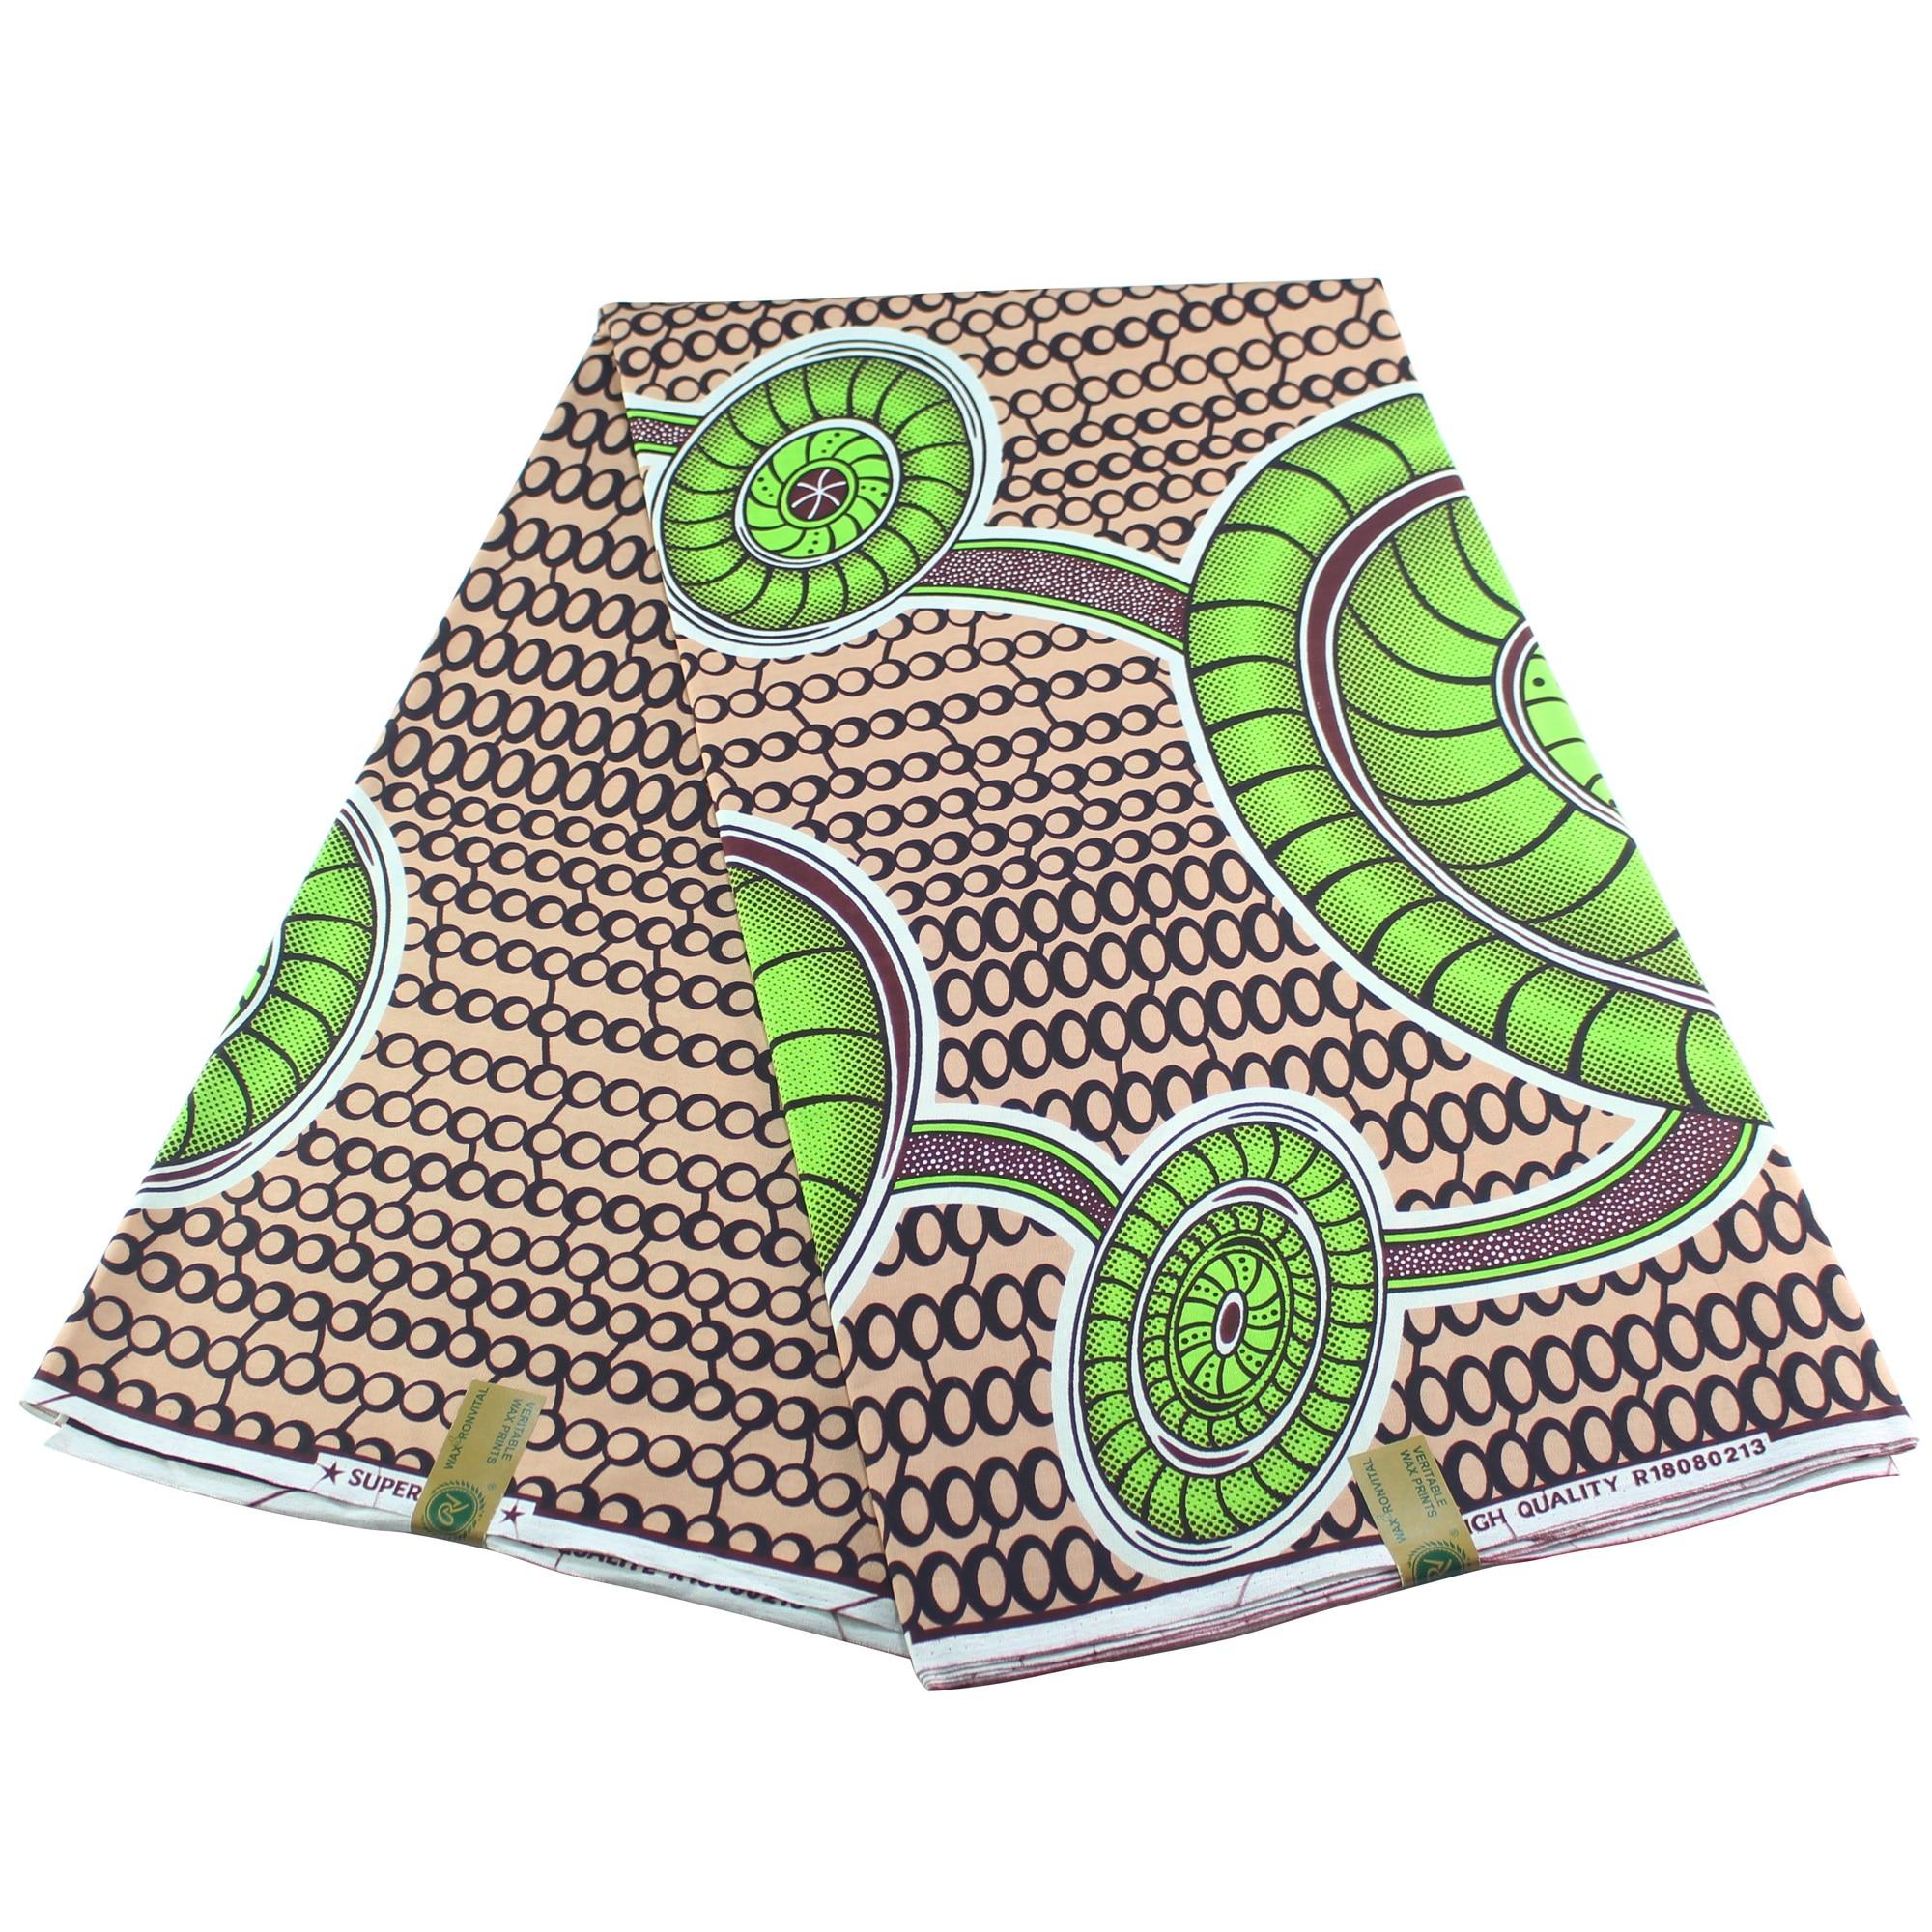 2019 Fashion DIY Veritable Wax Guaranteed Real Dutch Wax Pagne Ankara Sewing Fabric